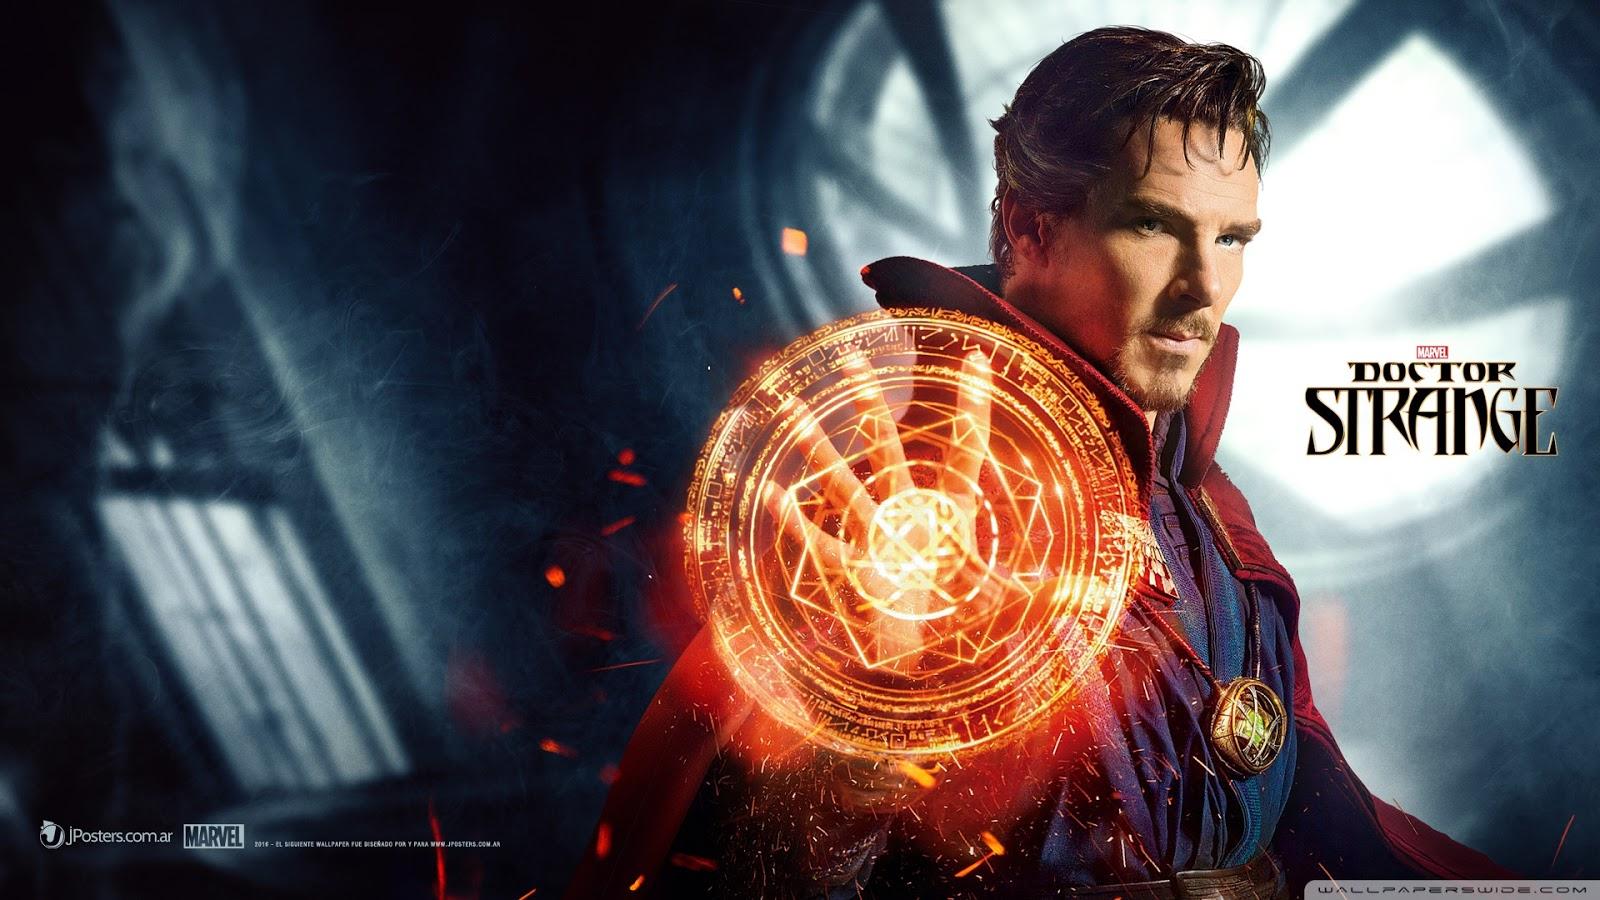 dr strange full movie free download in english